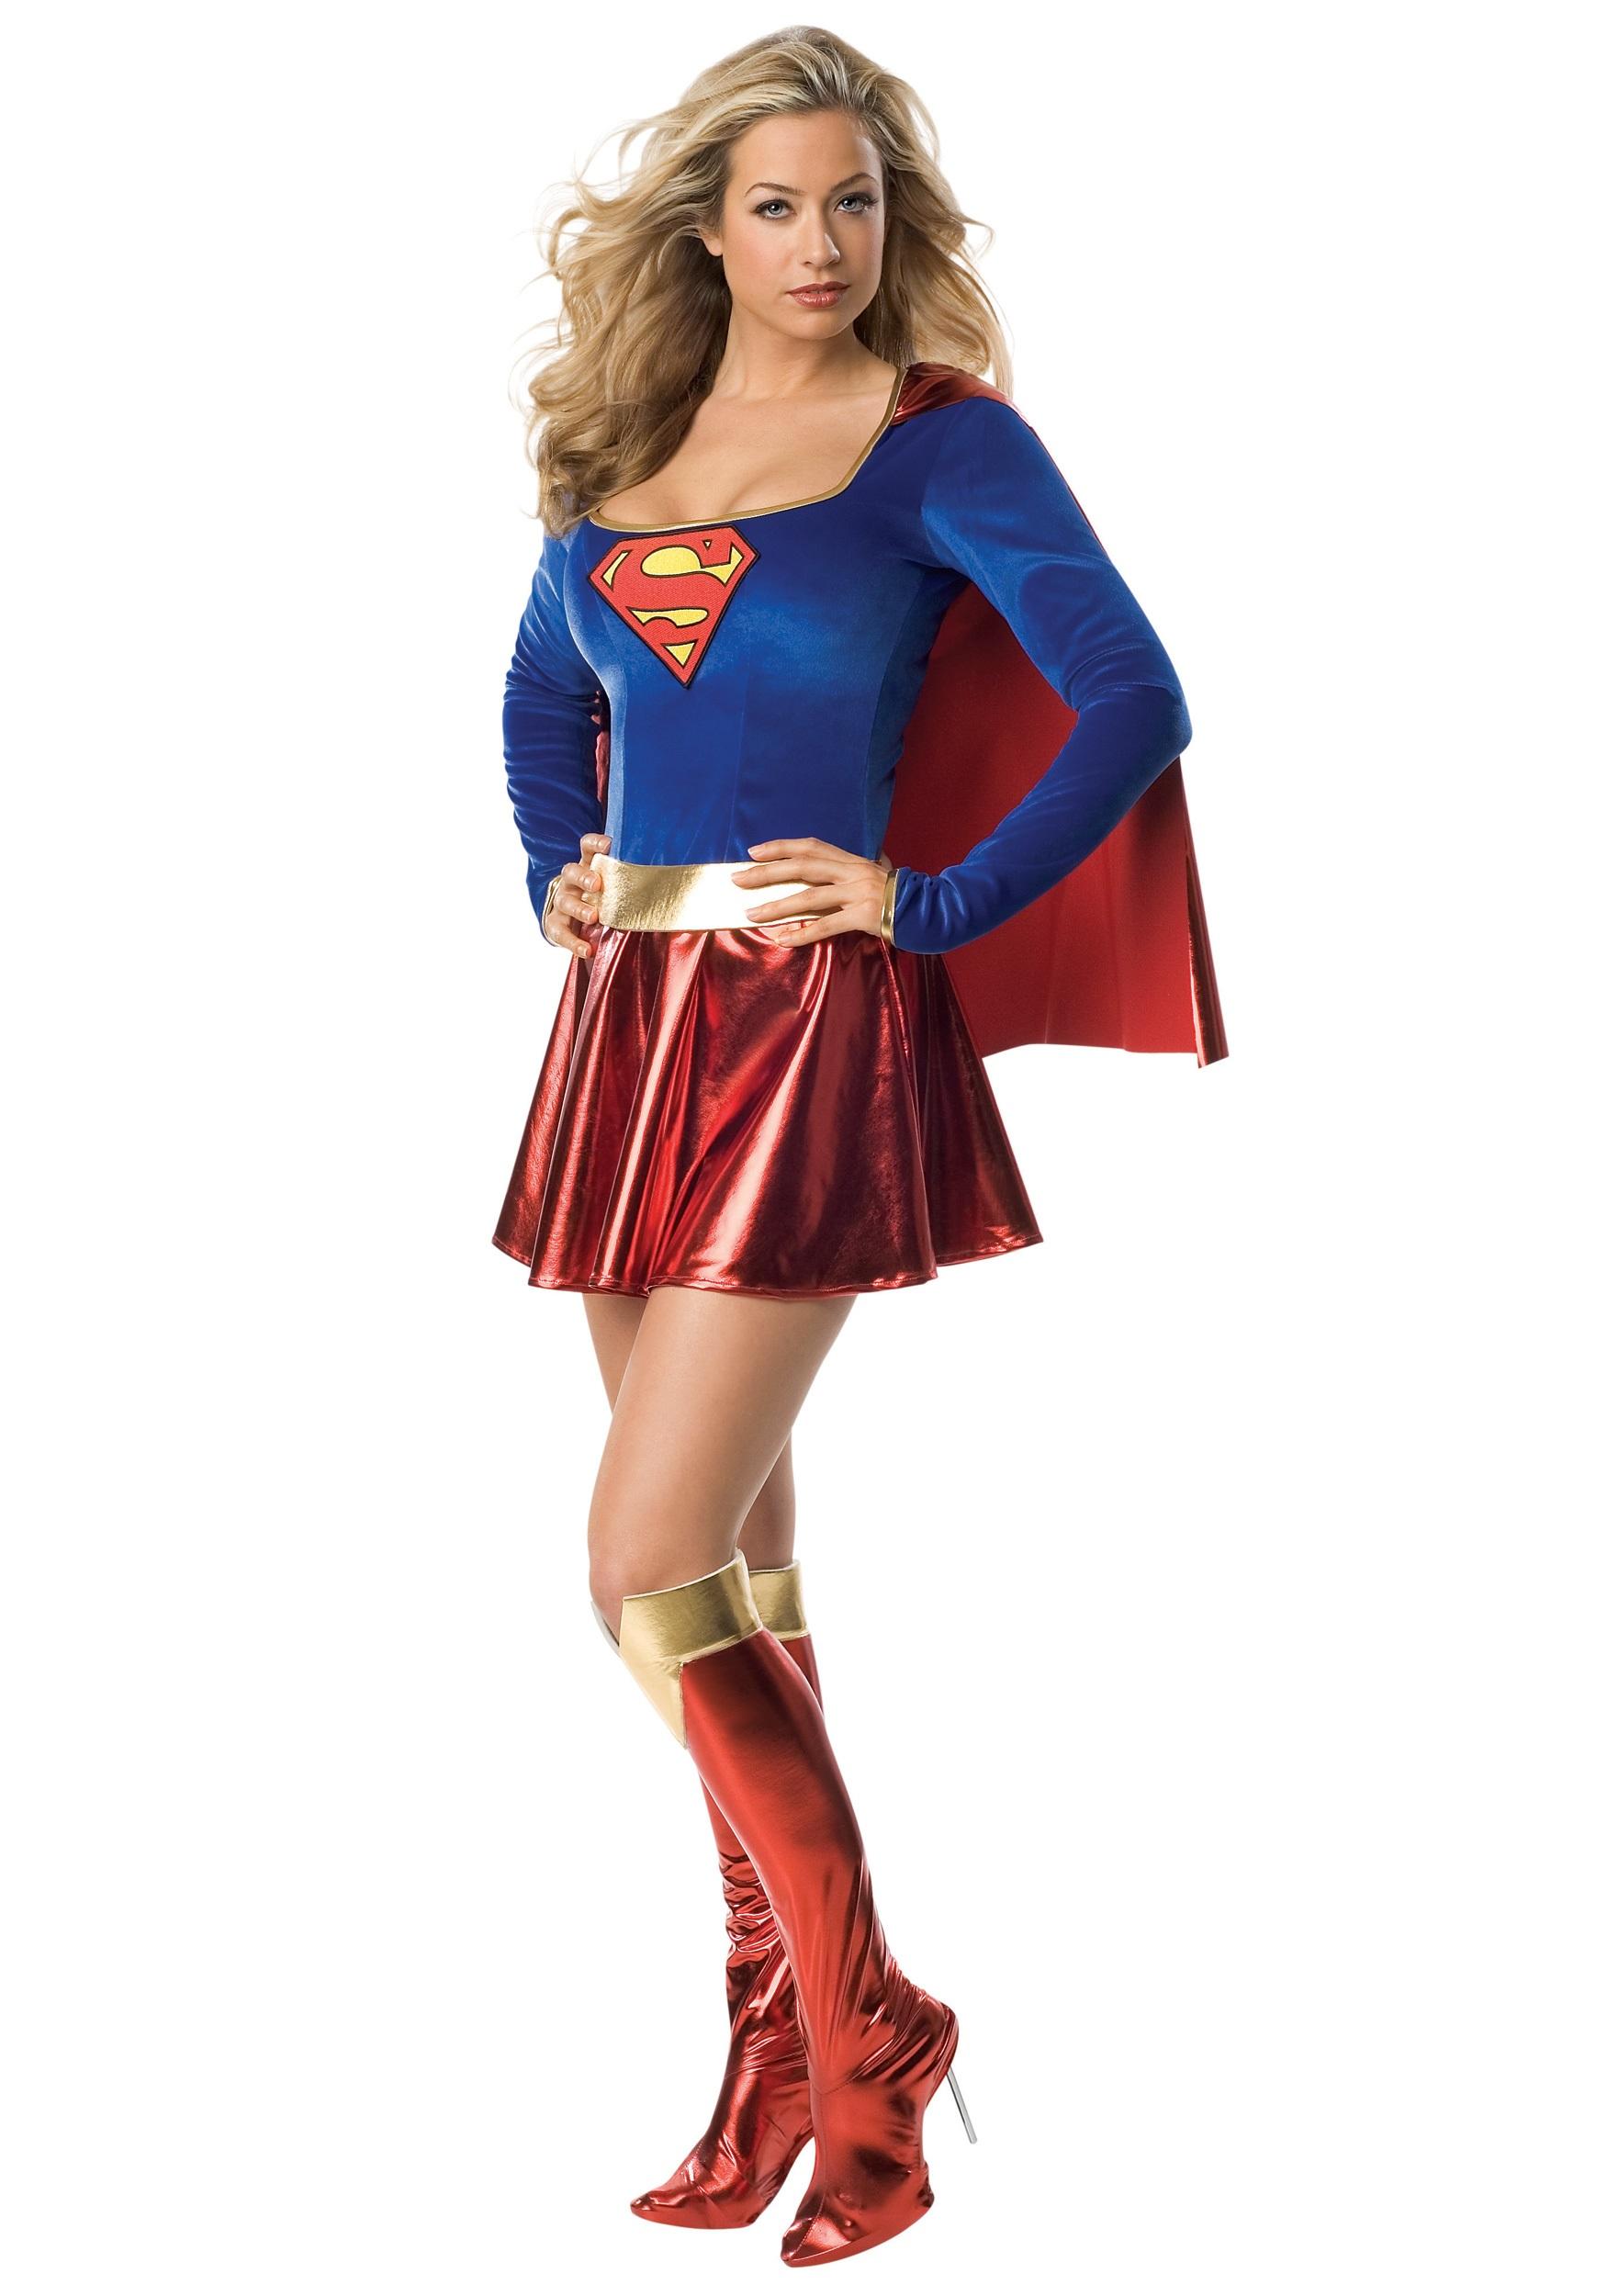 Women In Costumes Hot 21